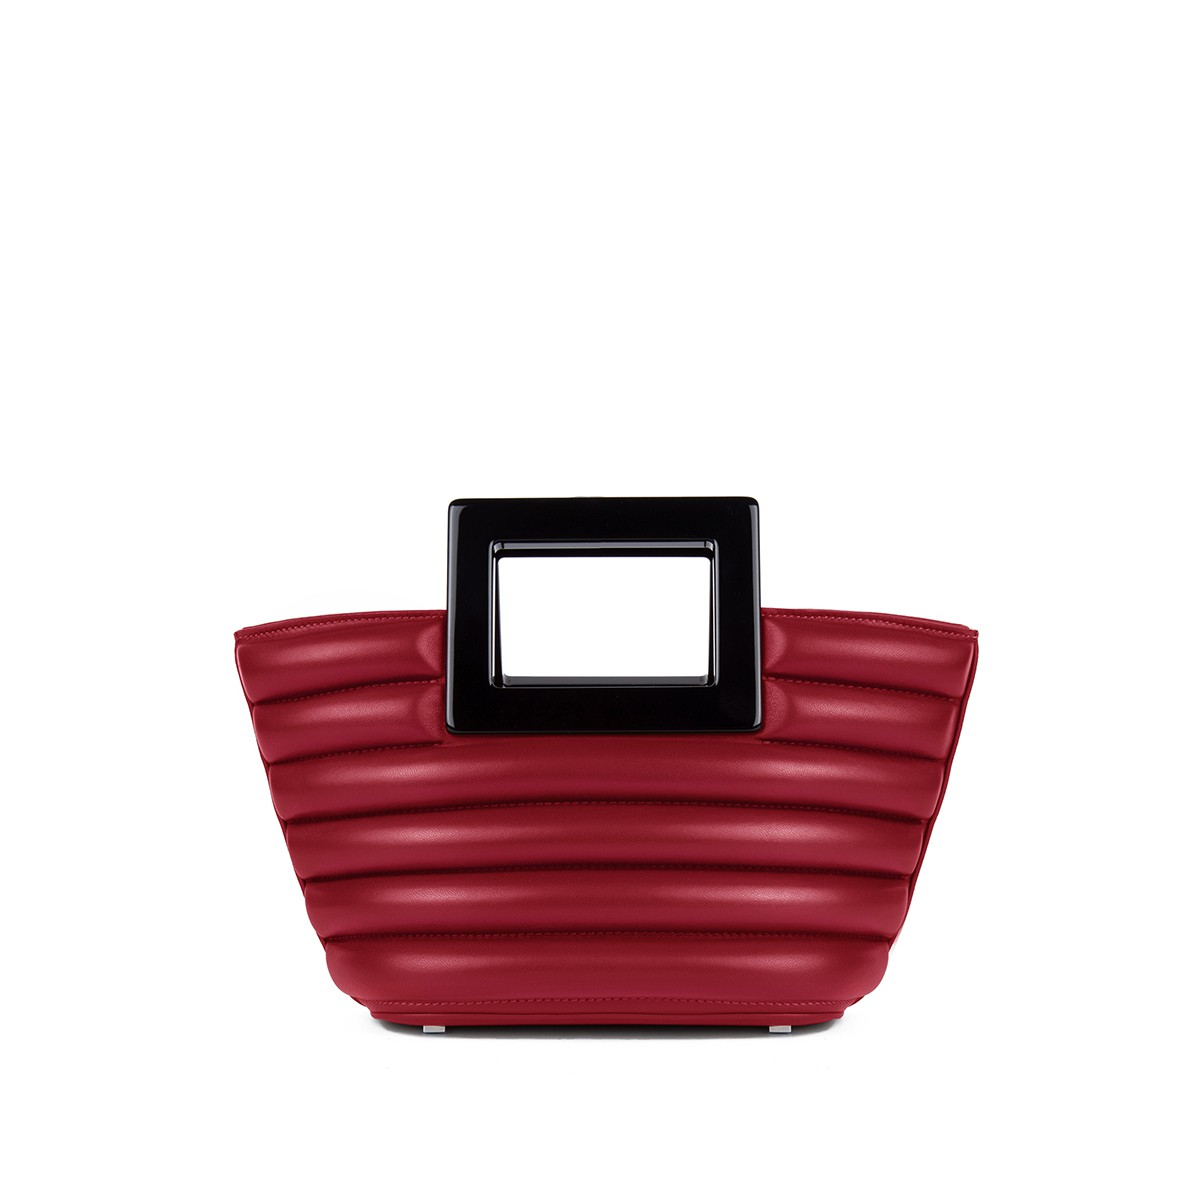 Micro Riviera in Crimson Quilted Napa1